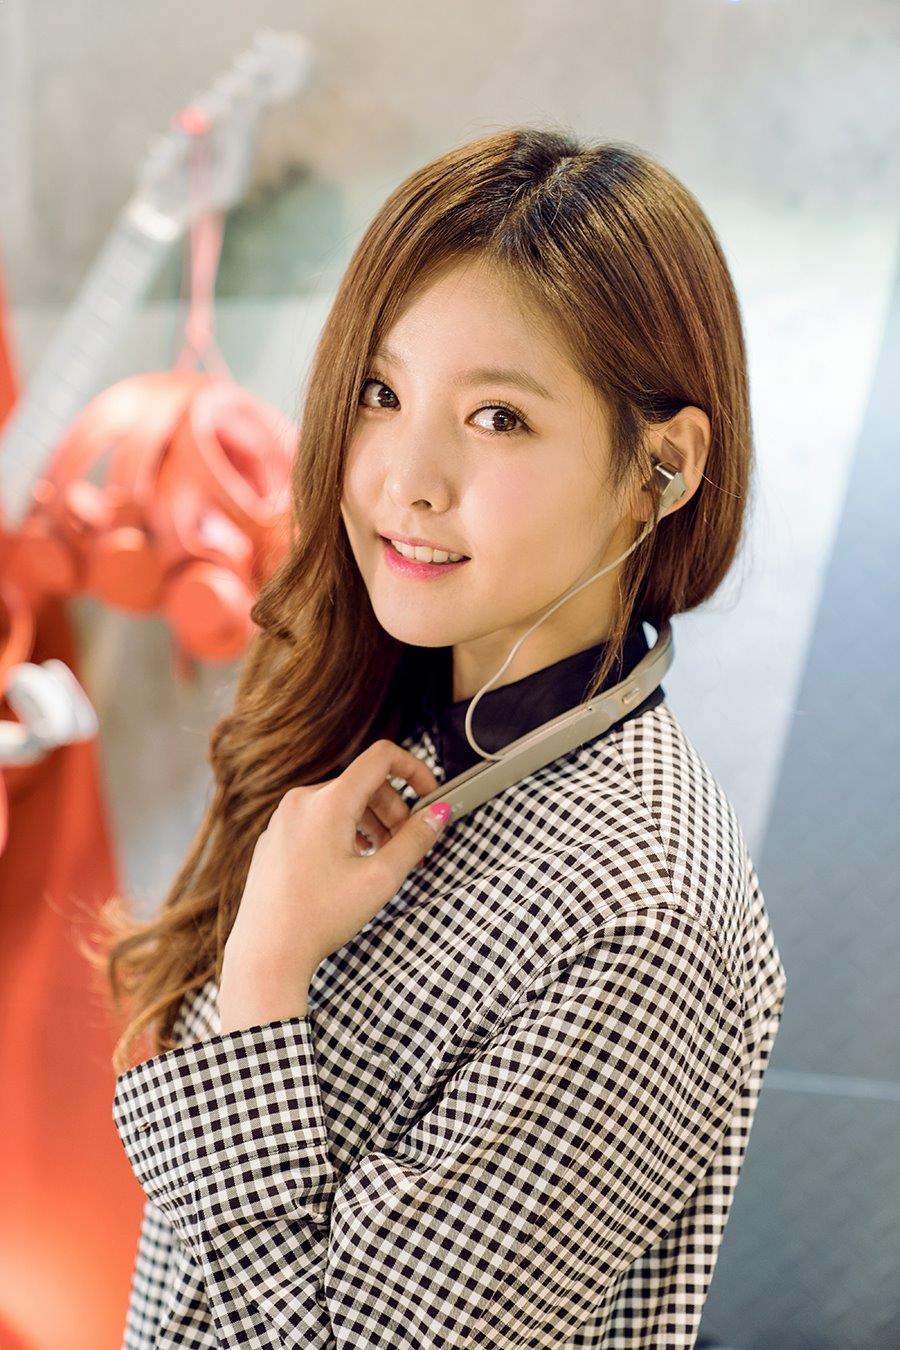 Real Girls Project, Real Girls Project Profile, Sony Korea, Sony Store Korea, Sony Audio Hongdae, Hongdae Korea, Hongdae Seoul, Real Girls Project JiWon, Real Girls Project JiSeul